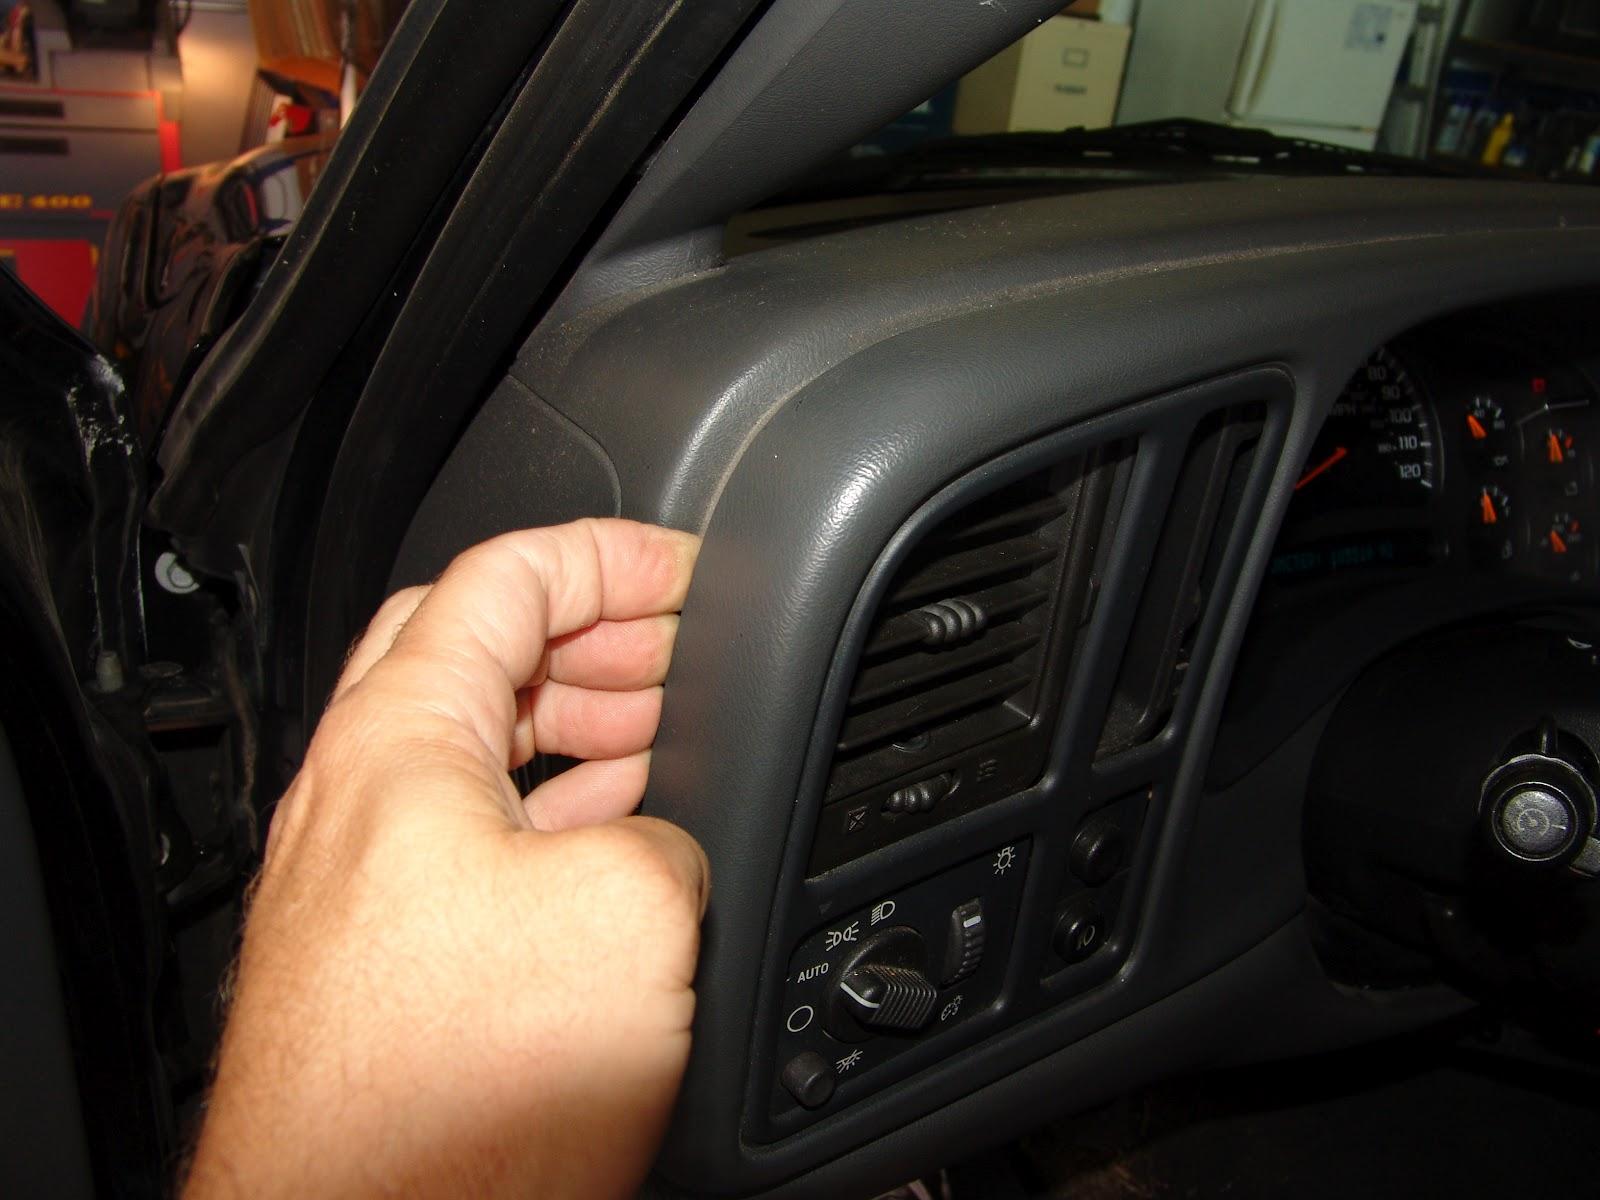 2008 silverado brake light switch removal autos post. Black Bedroom Furniture Sets. Home Design Ideas